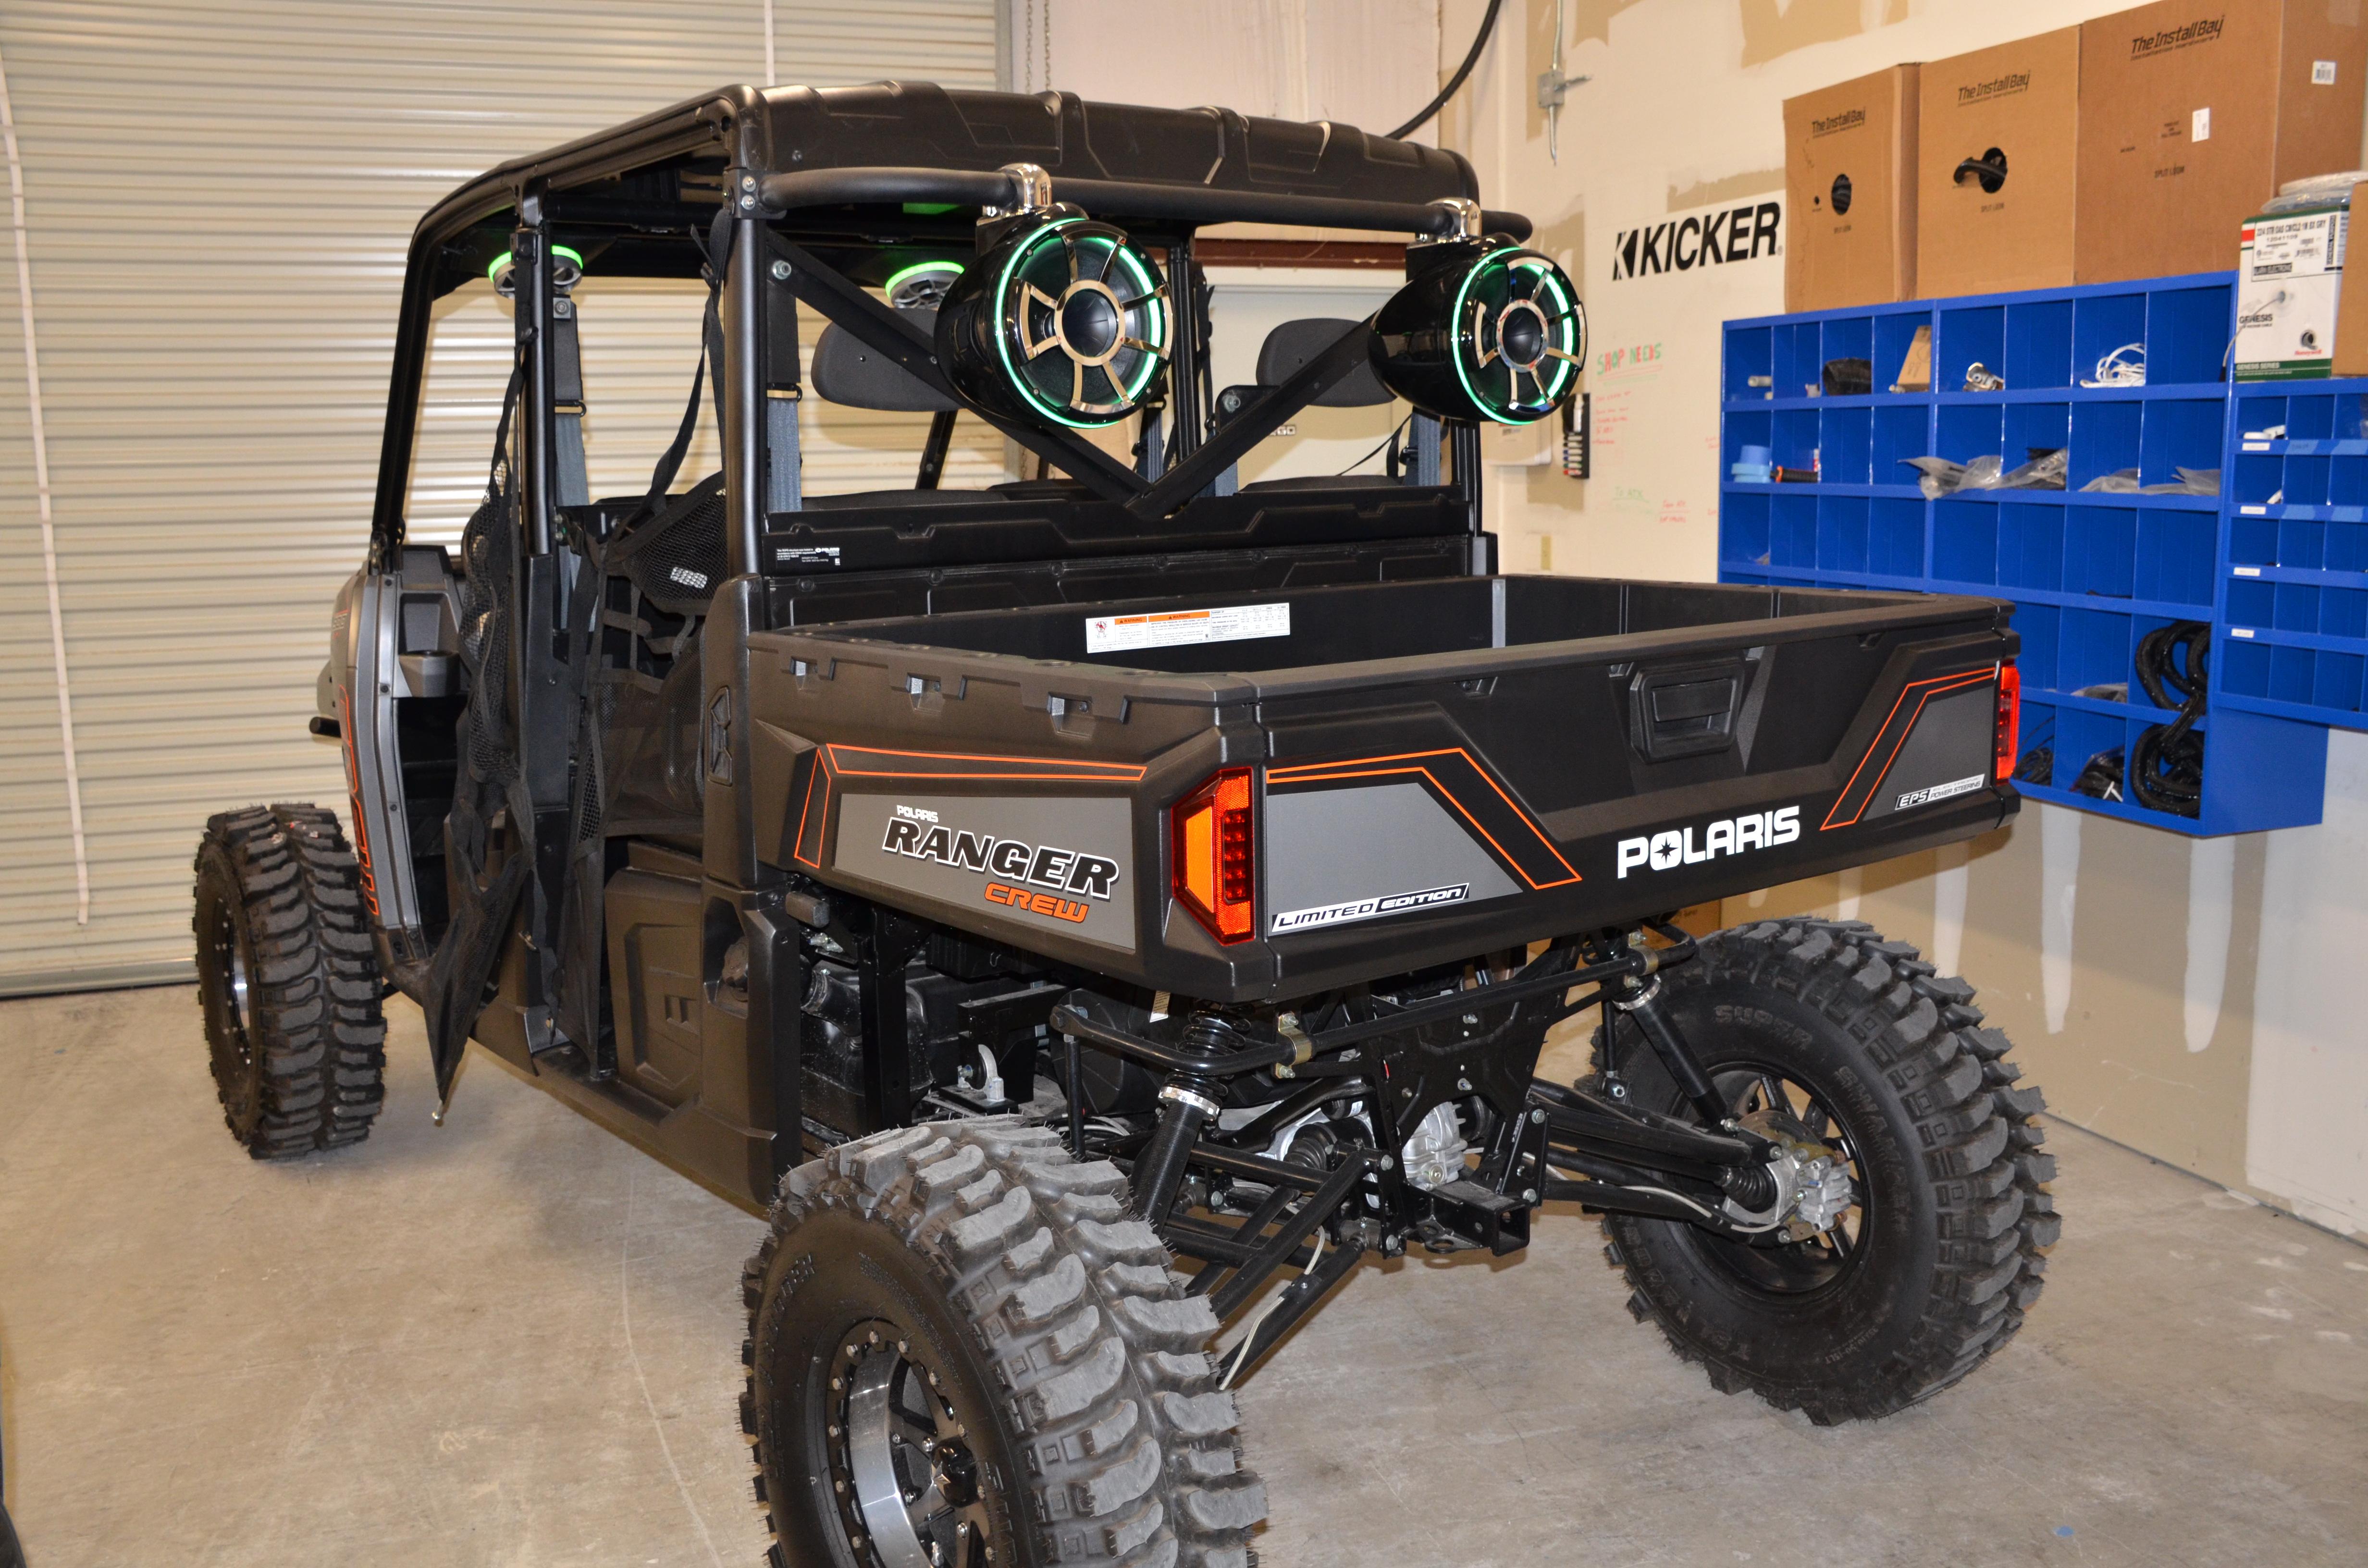 2014 Polaris Ranger Crew Lifted Wet Sounds JL Audio Pods Subwoofer REV10s Marine Amplifier Charging Cord